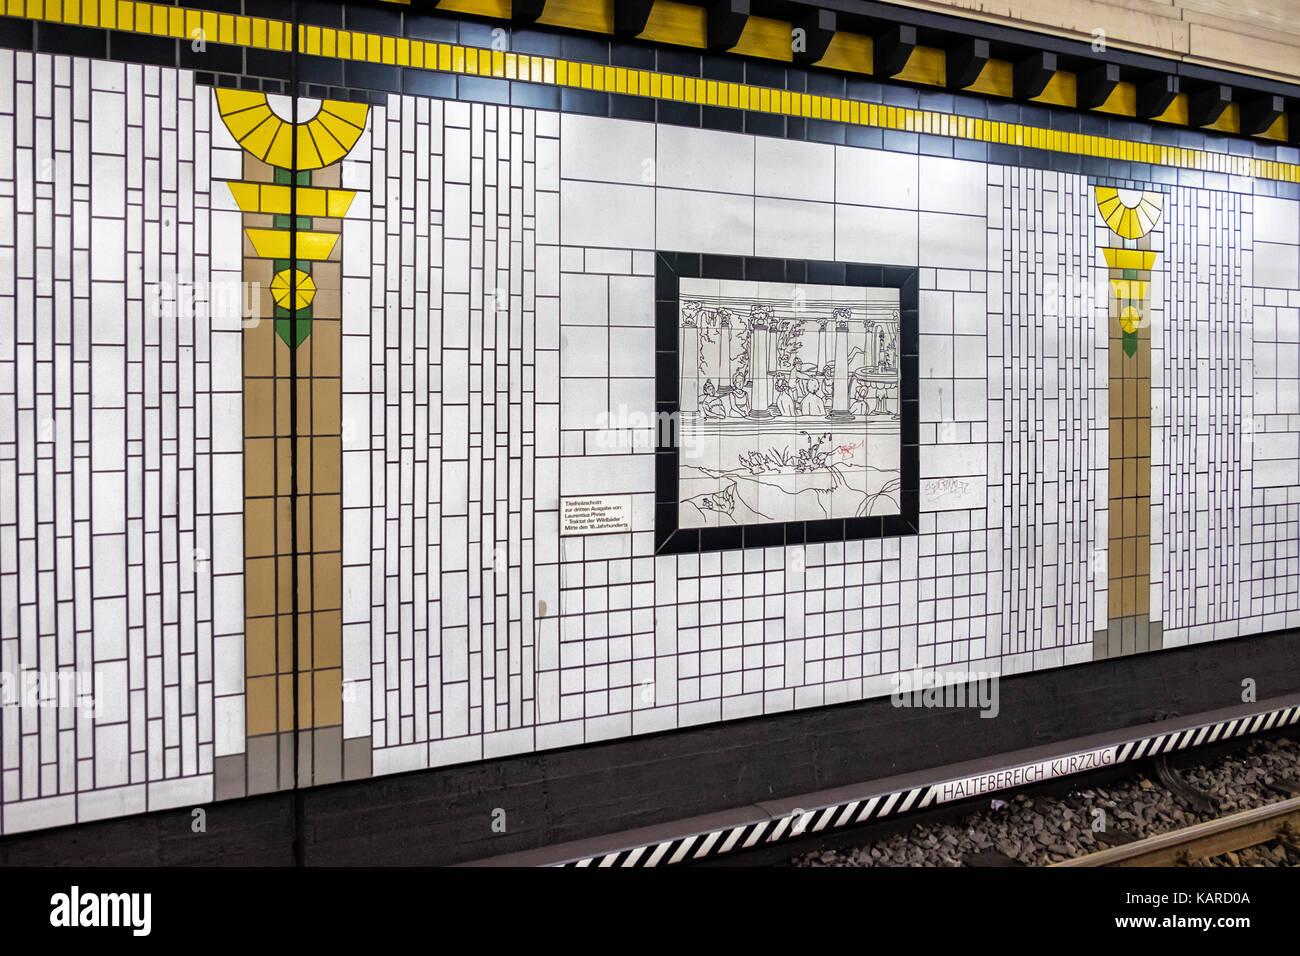 Berlin Paracelsus - Schlechte u-bahn station Interieur & Plattform ...